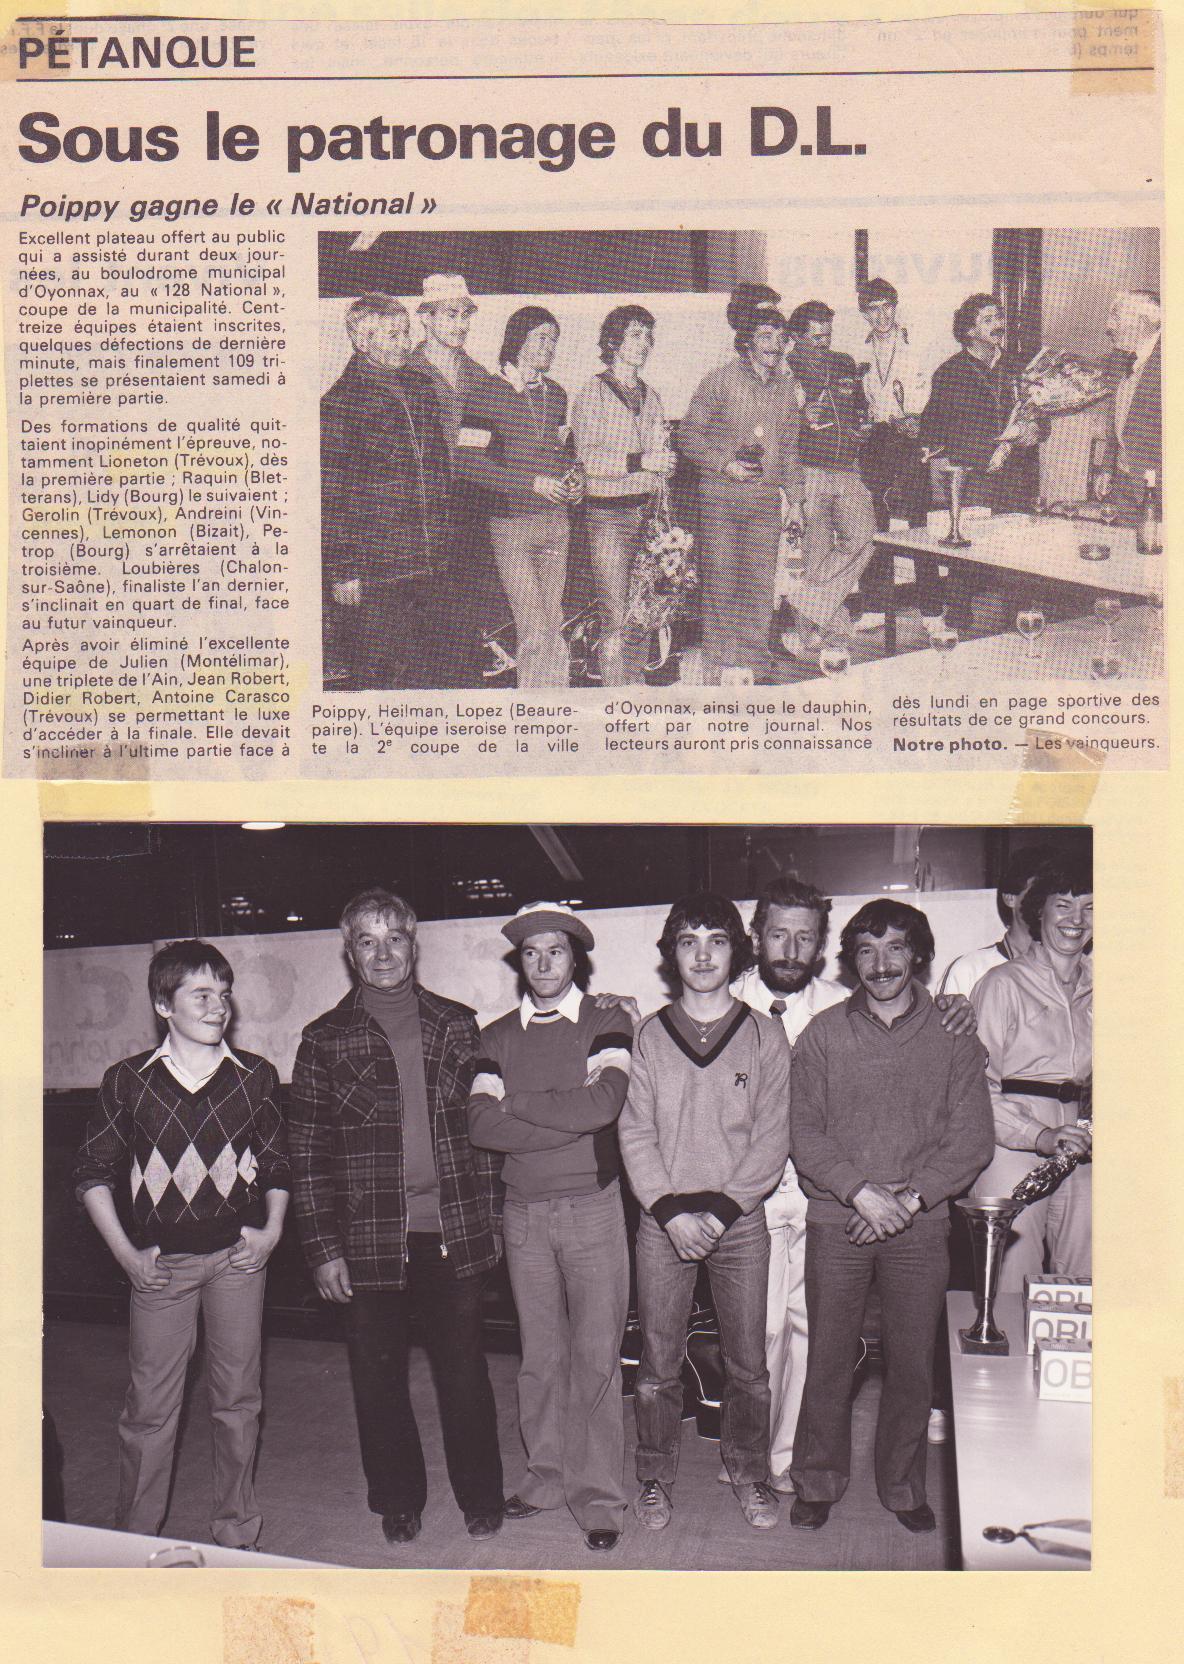 National Oyonnax 1981